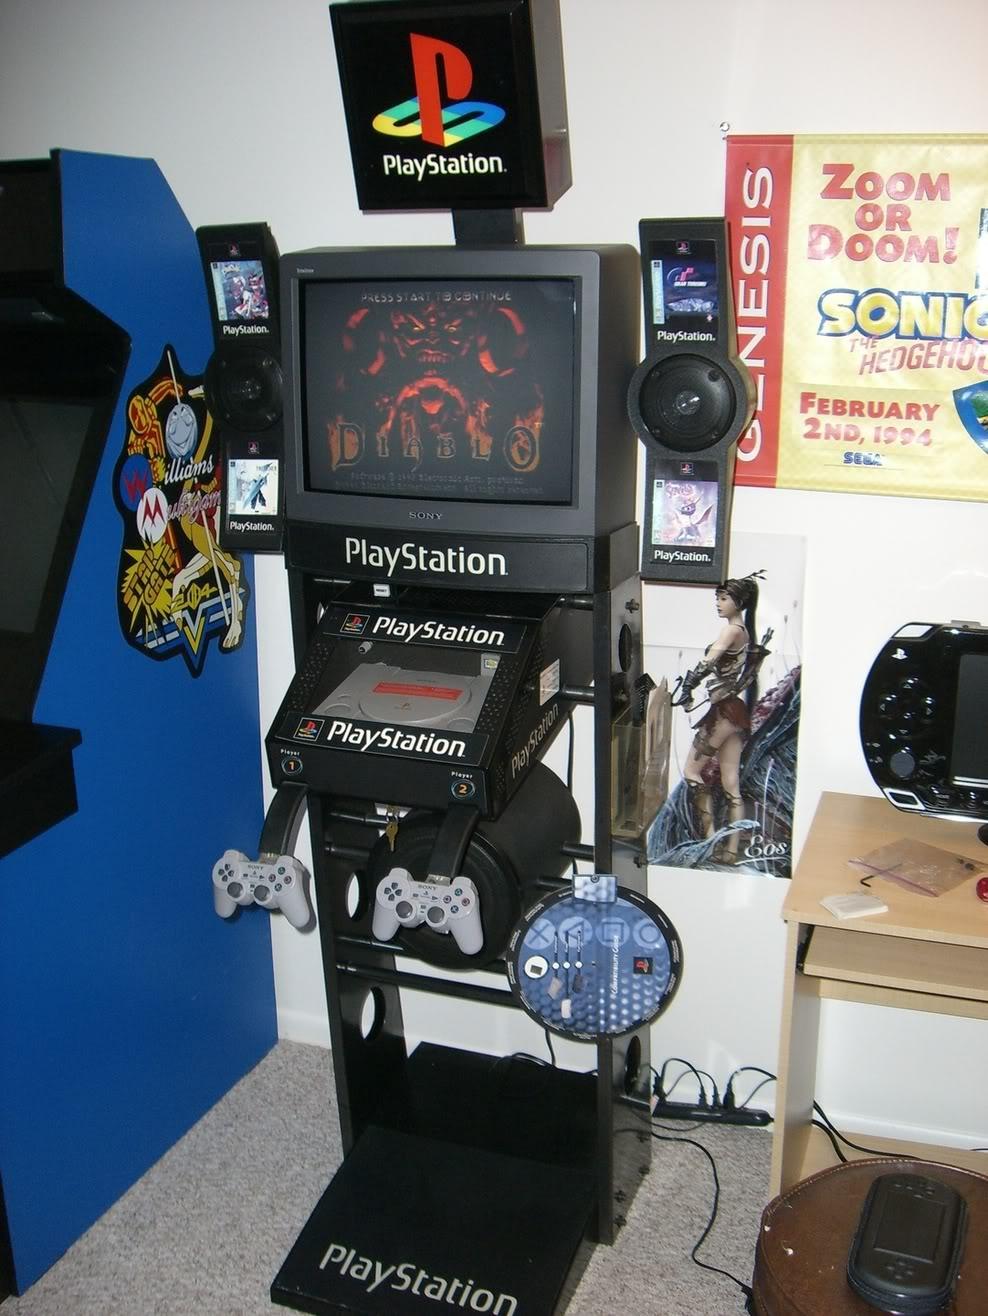 playstation 1 kiosk, ps1 kiosk, playstation kiosk